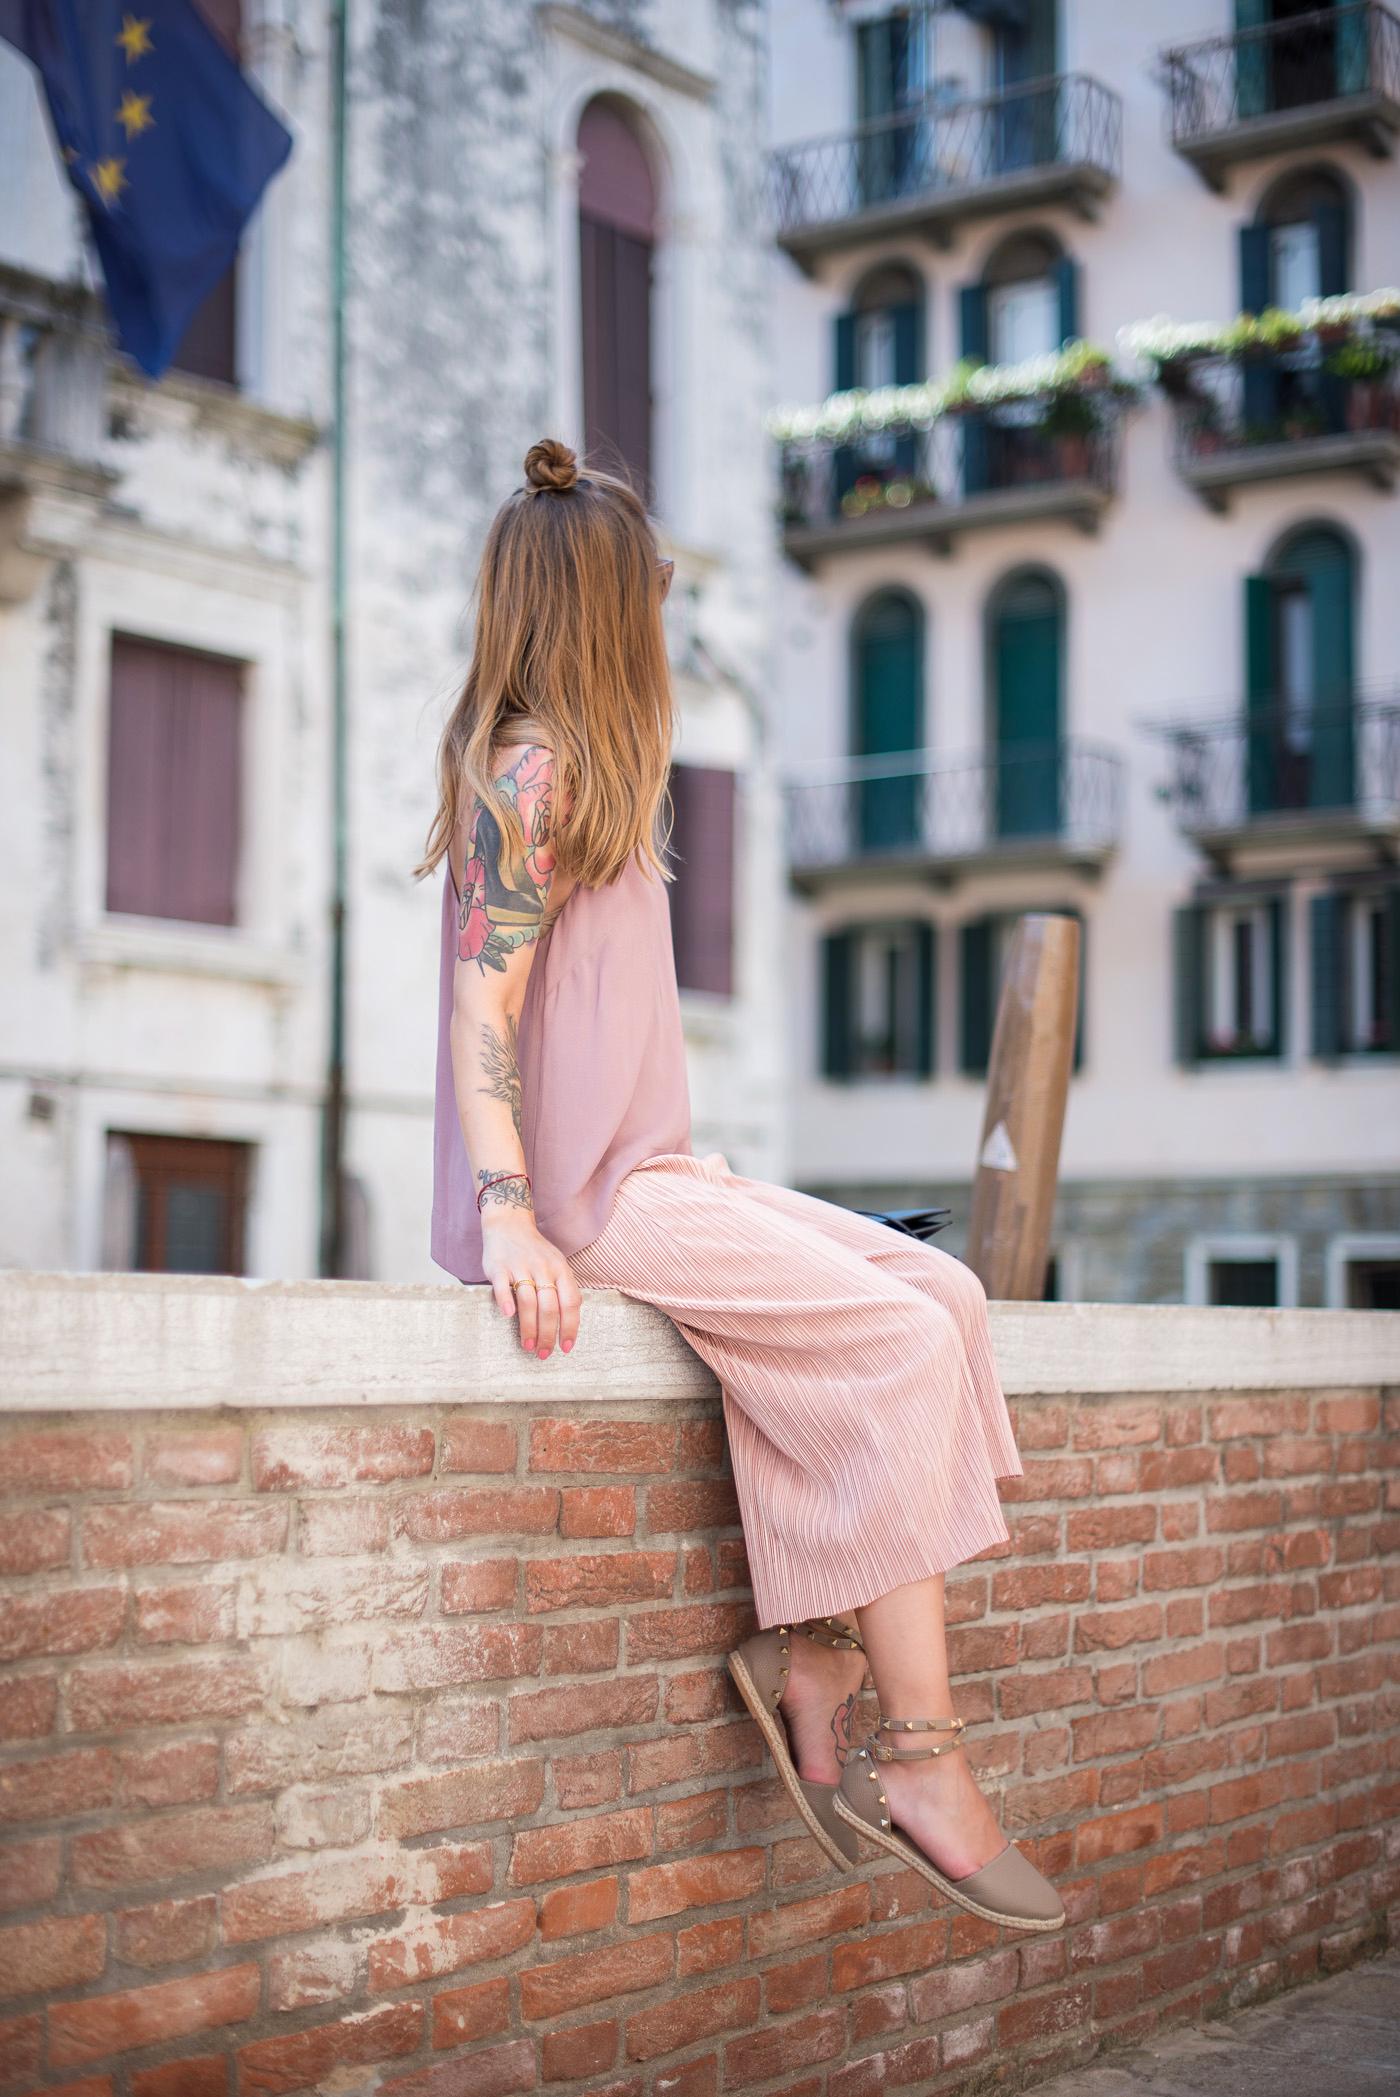 Candy_colors_culotte_outfit_in_Venezia_1